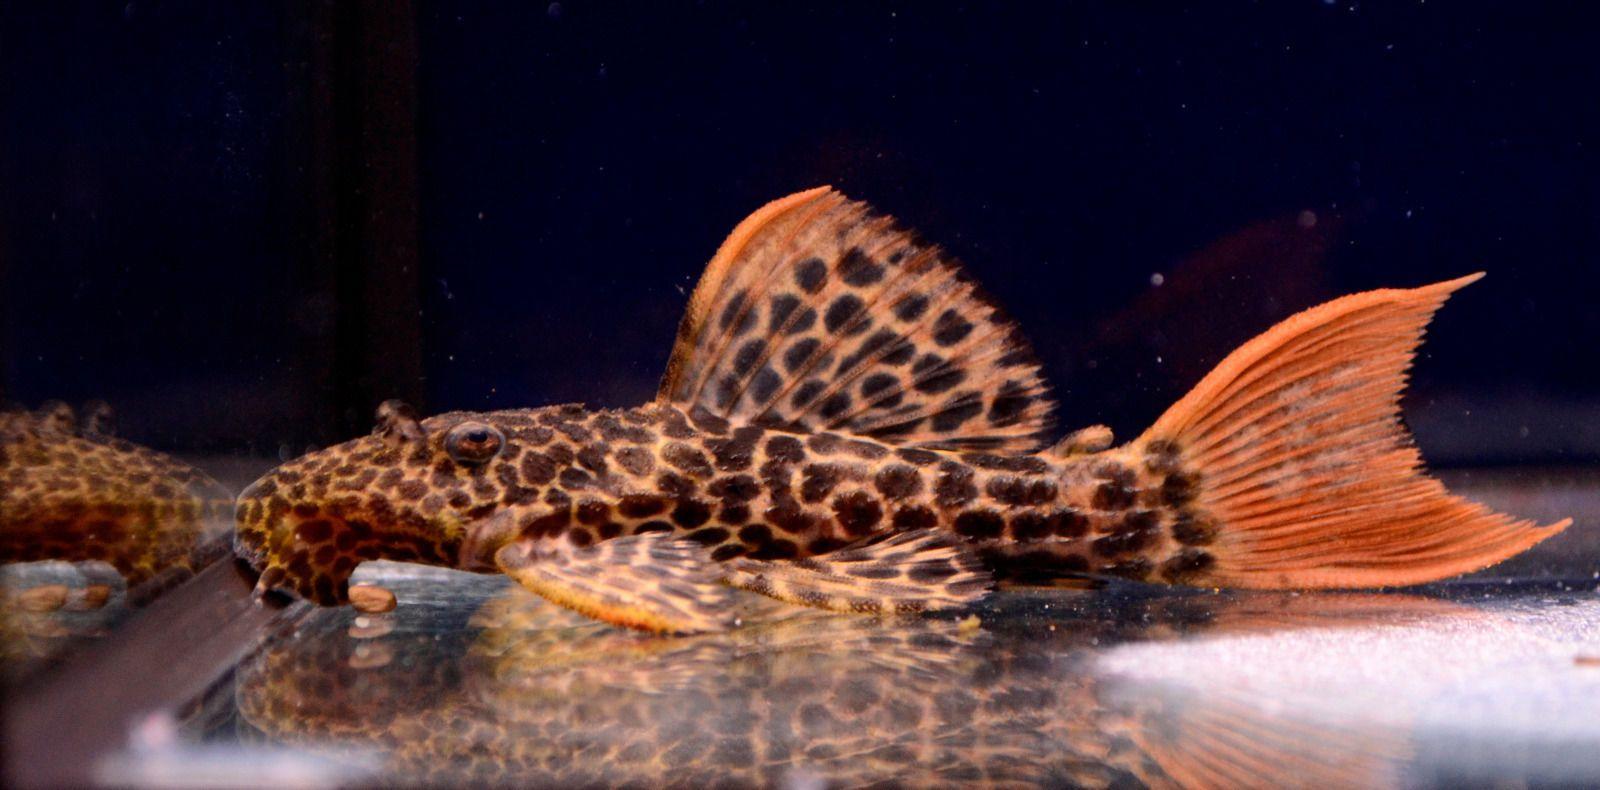 Live Rare Freshwater Fish 2 Leopard Cactus Pleco L 114 Fancy Suckermouth Tropical Fish Aquarium Fish Tropical Fish